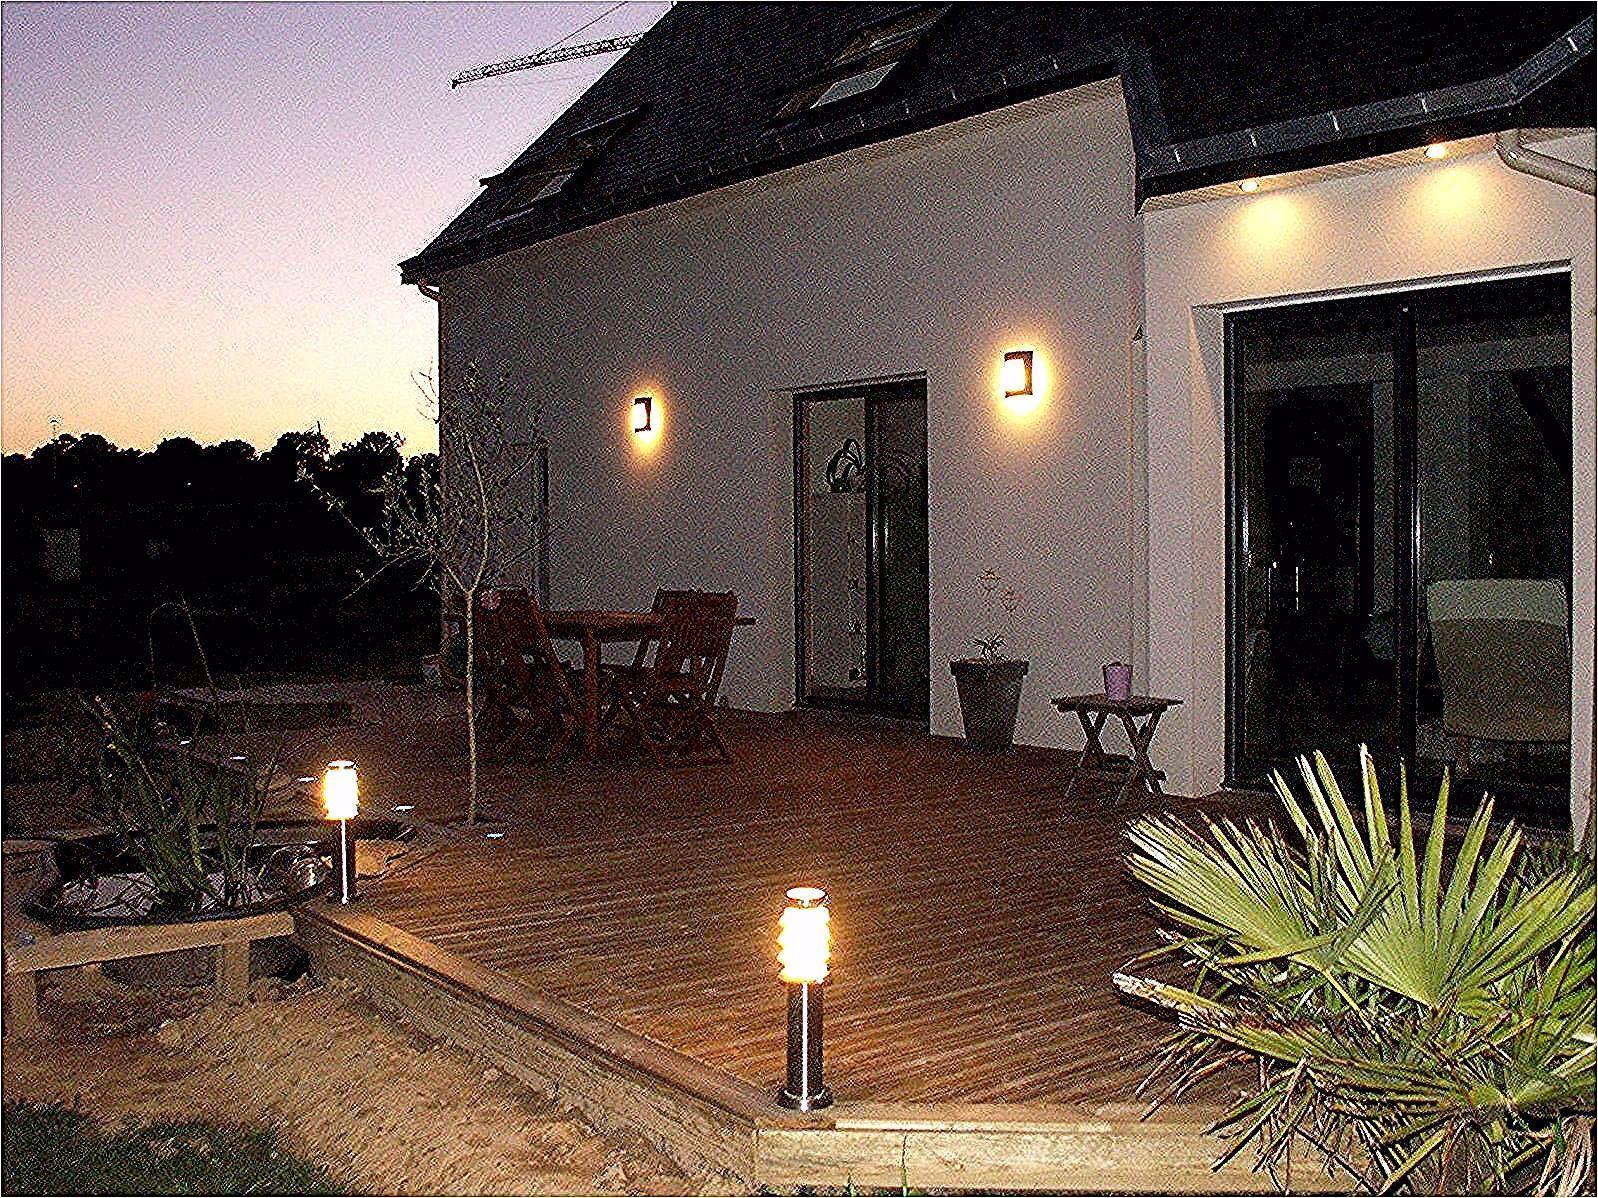 Eclairage De Terrasse Exterieur eclairage terrasse exterieur . 14 détail eclairage terrasse